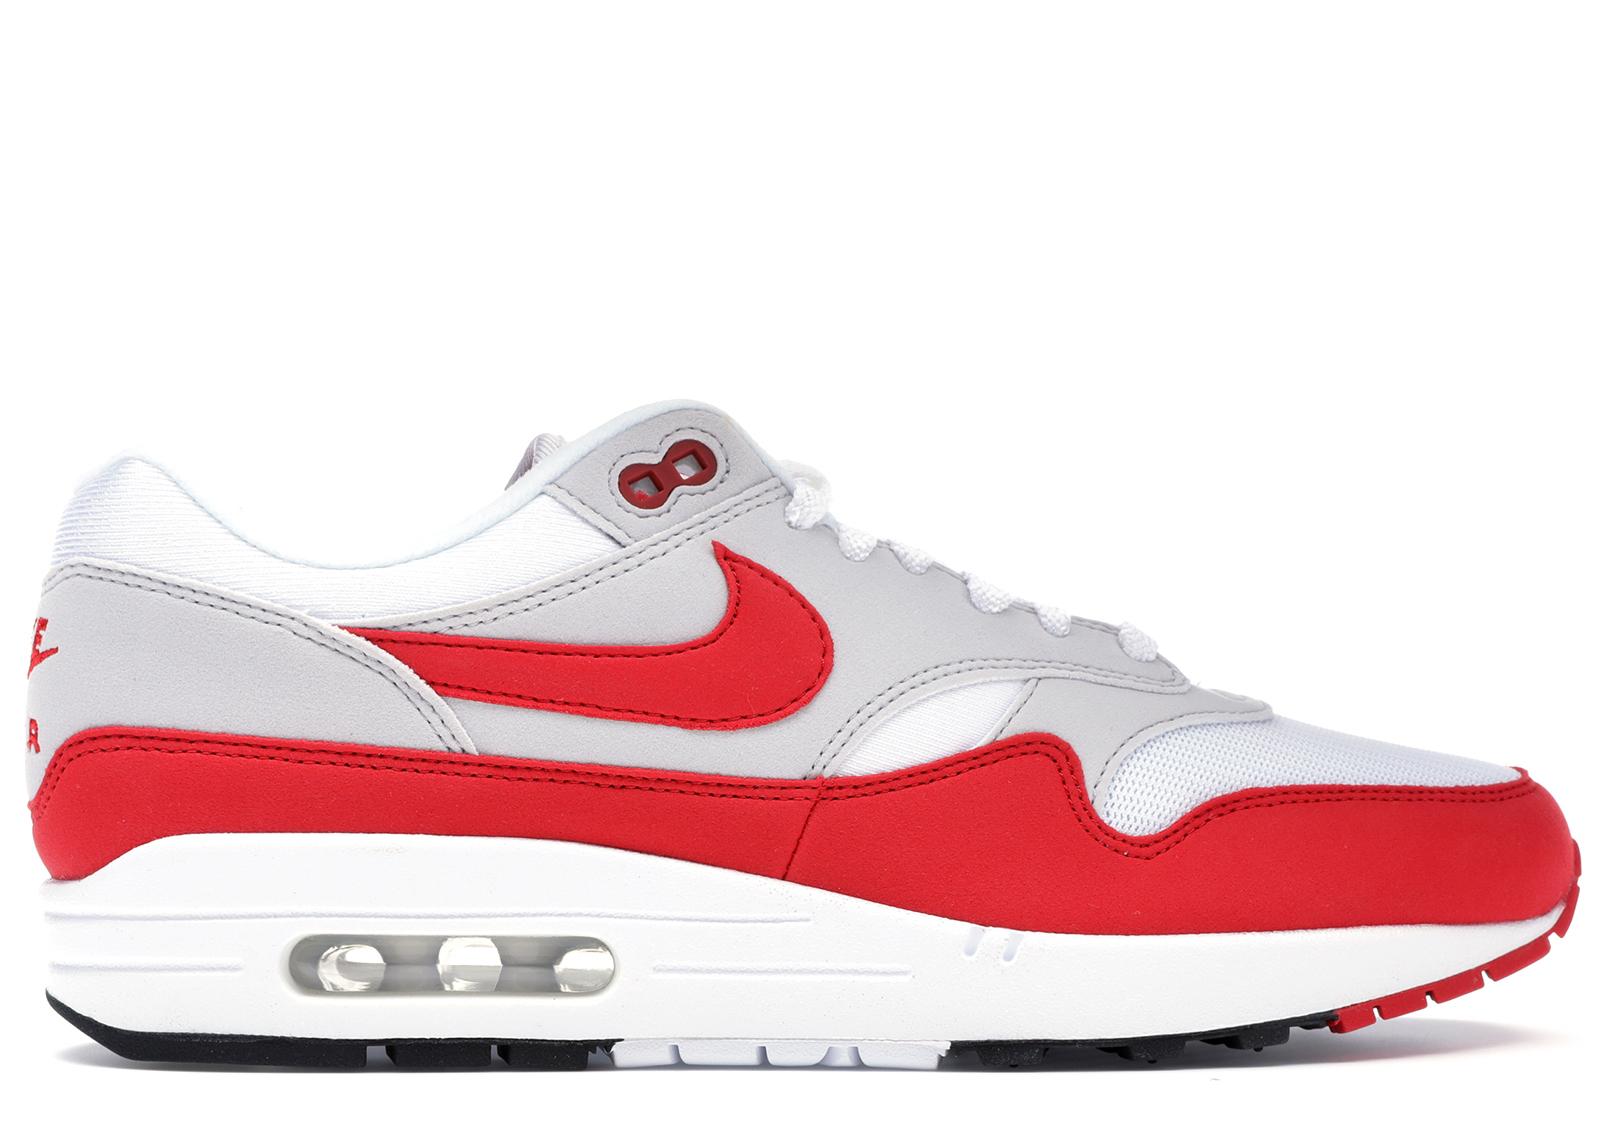 Nike Air Max 1 Anniversary Red (2017